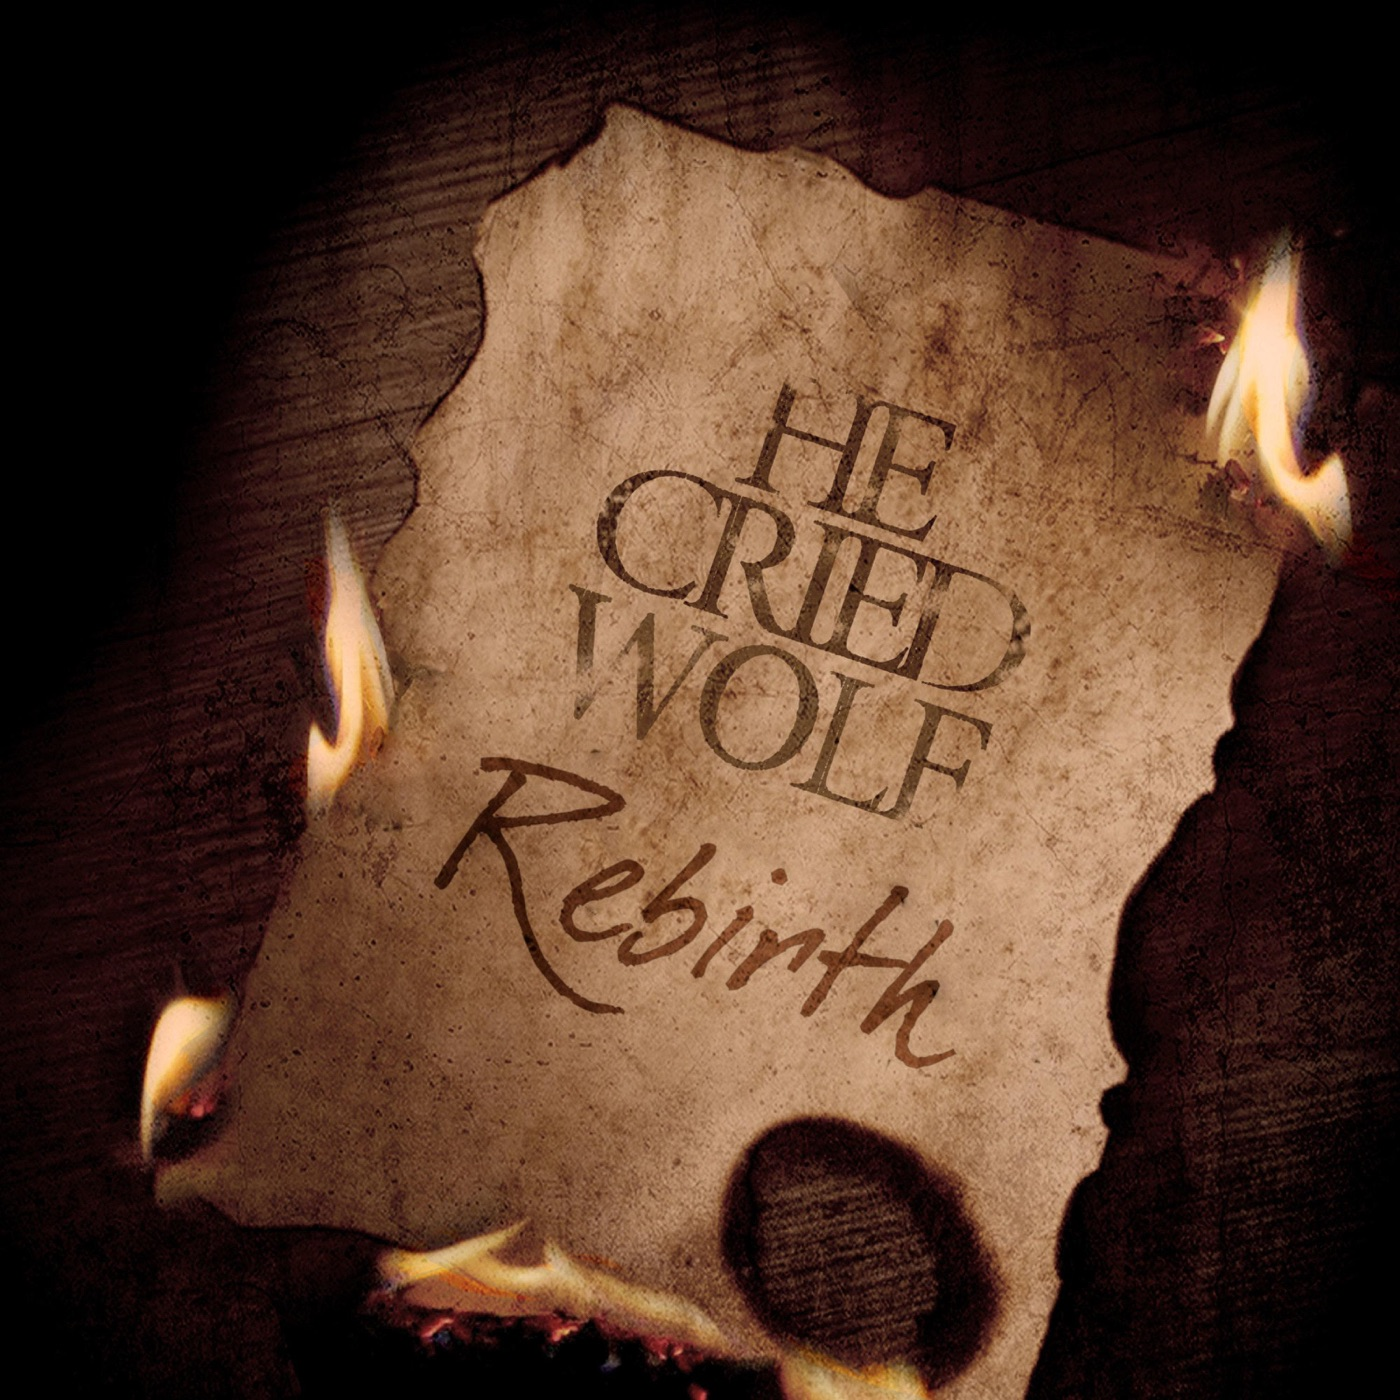 He.cried.wolf - Rebirth [single] (2019)